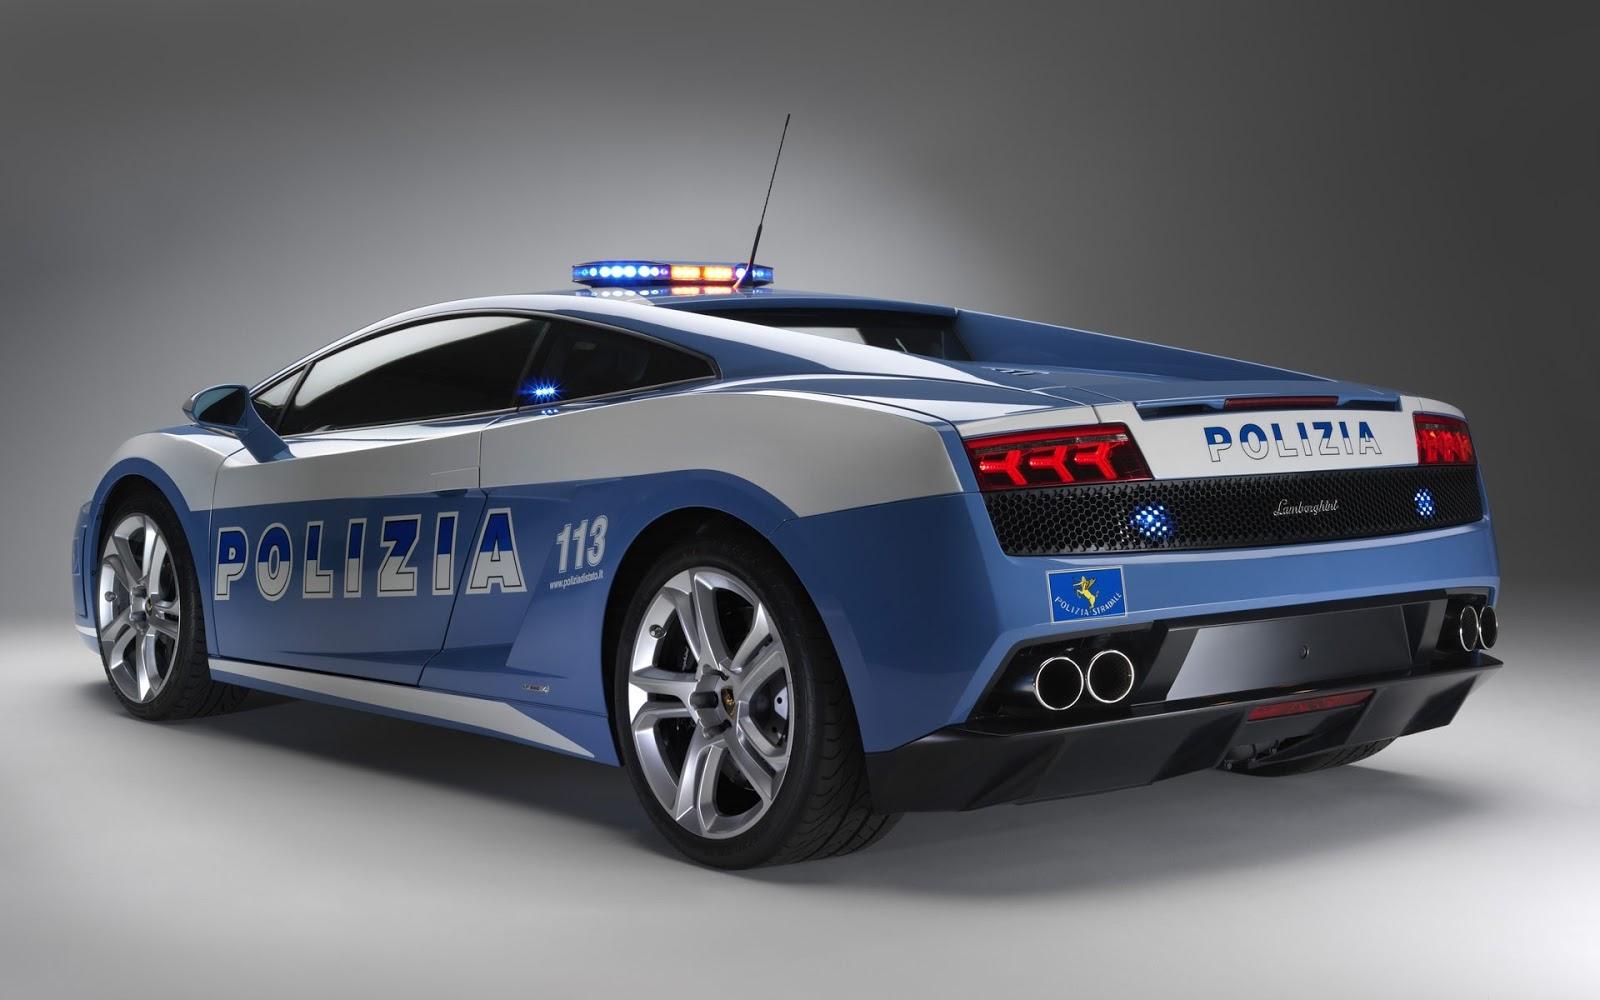 Lamborghini Gallardo Police Car Pictures Cars Wallpapers HD 1600x1000